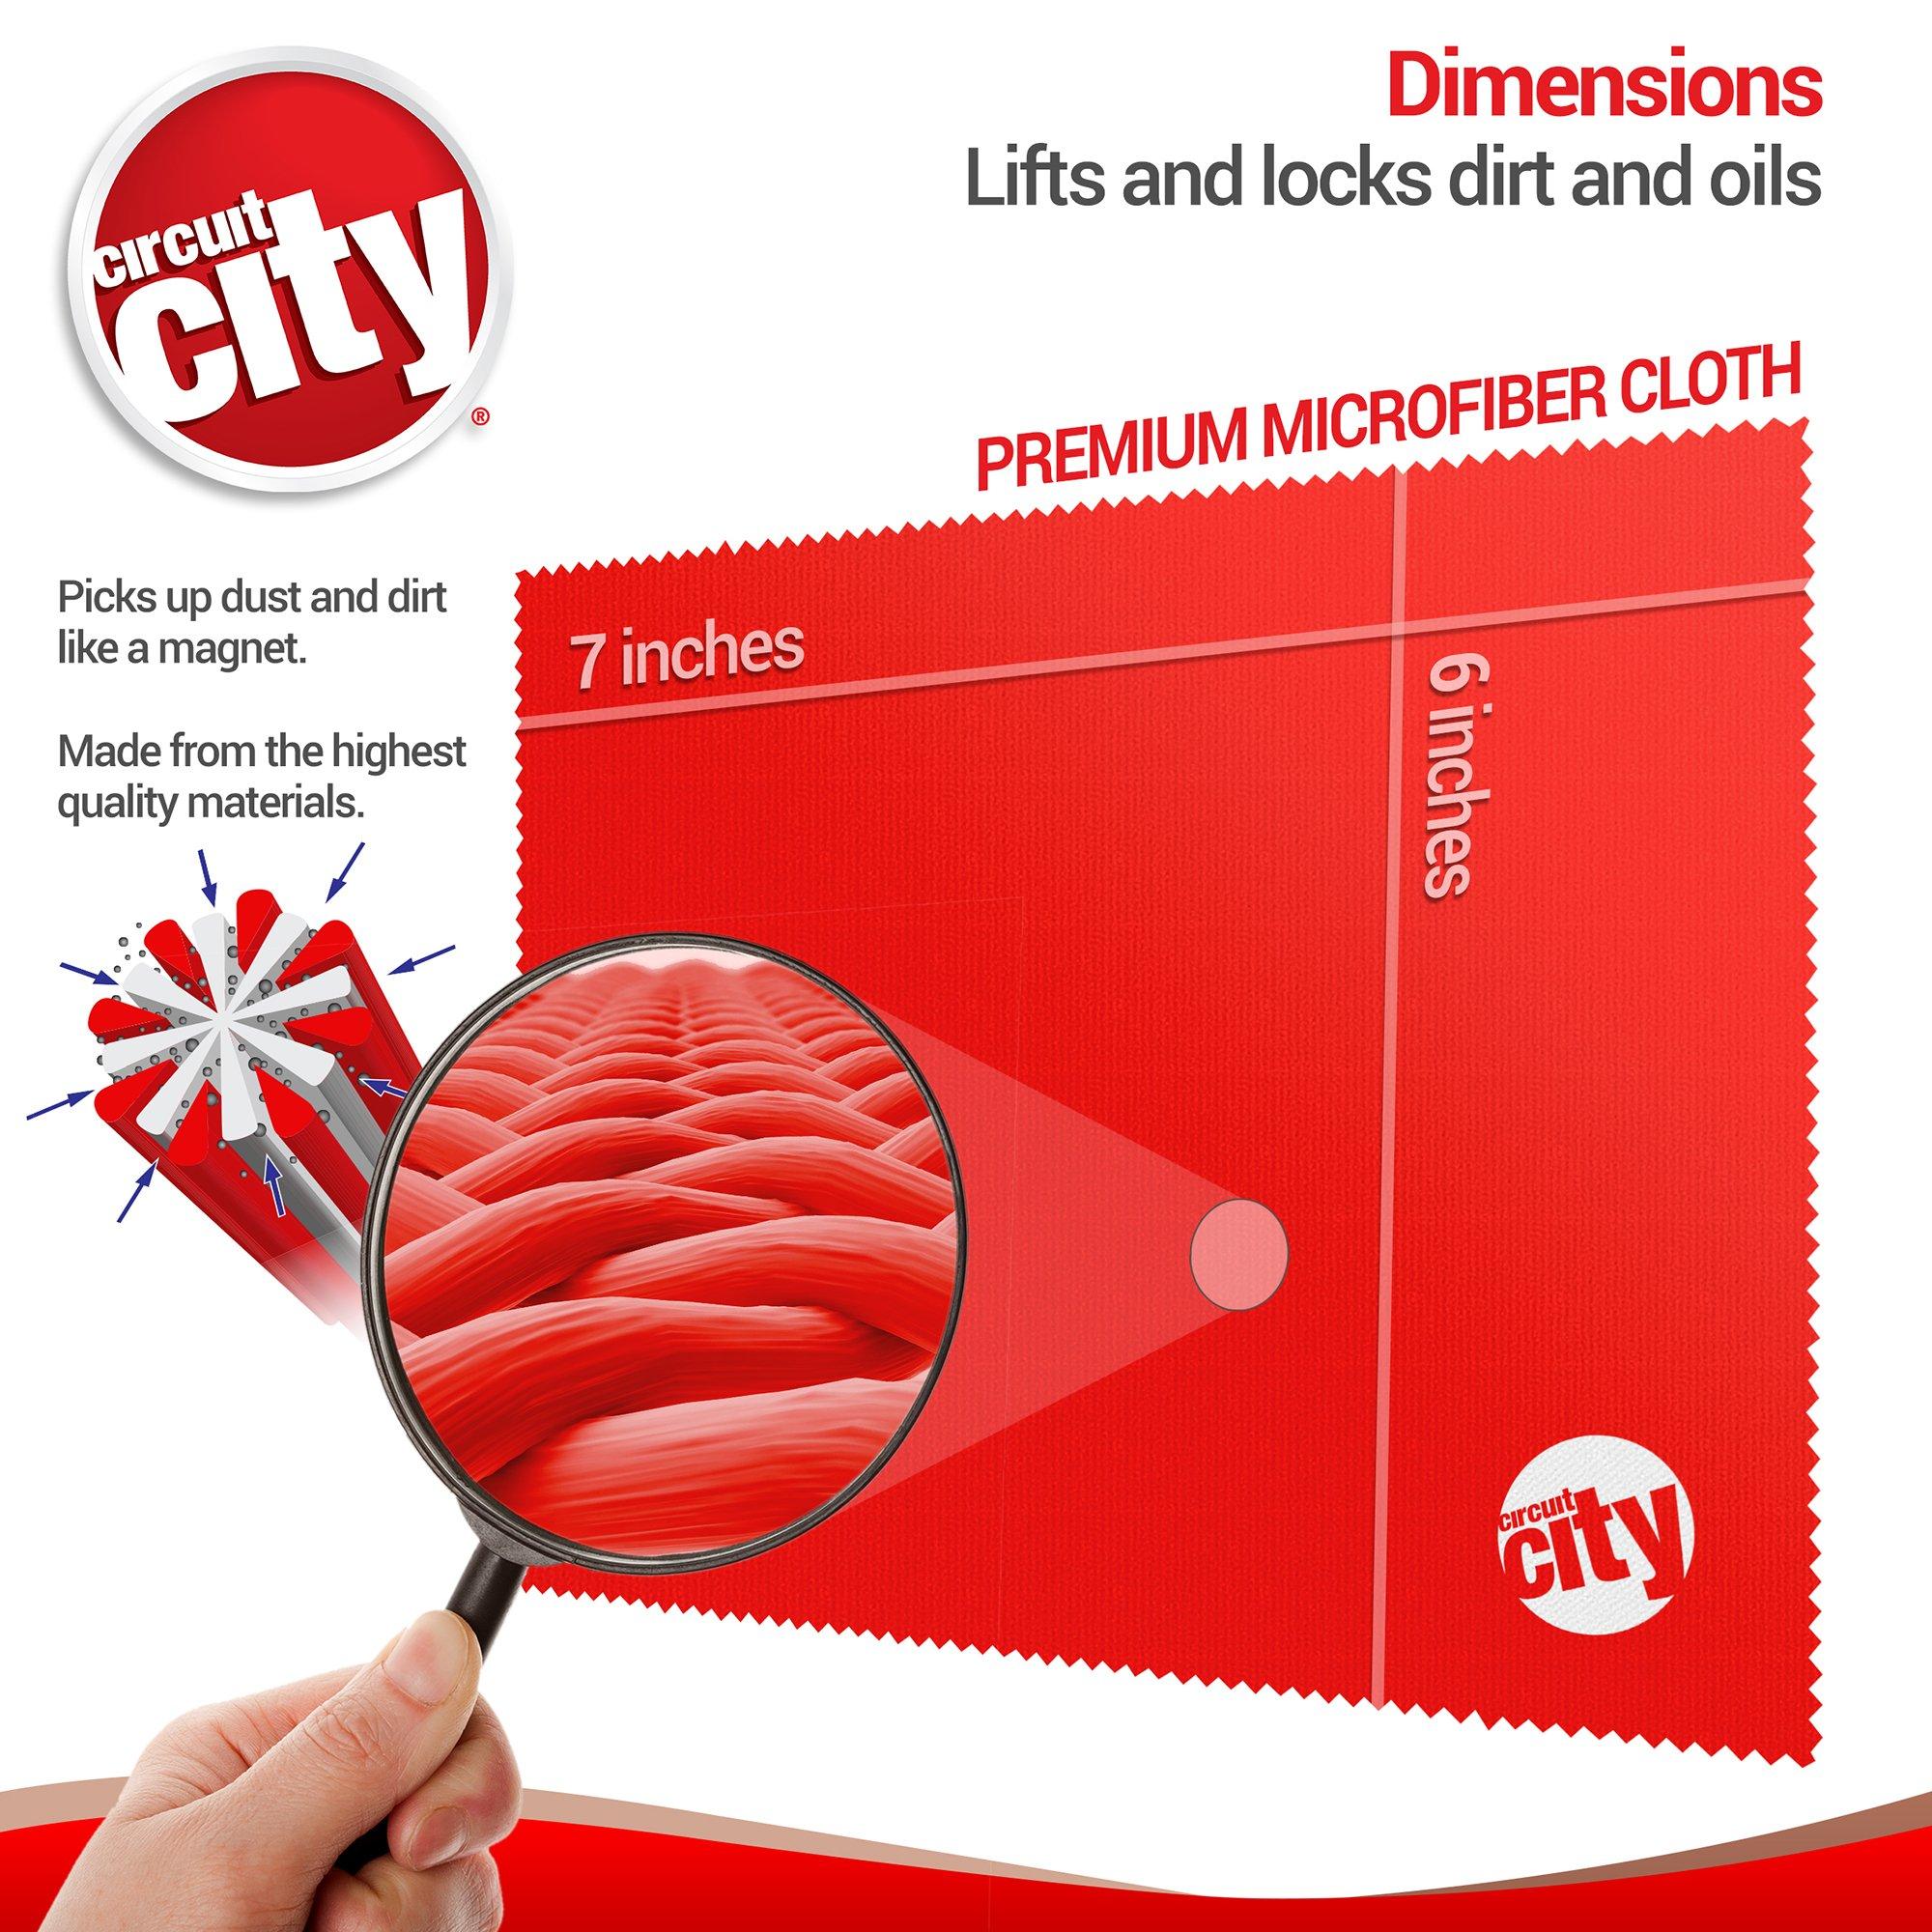 Circuit City Sightmark IR-805 Compact Infrared IR Illuminator Flashlight w/Batteries + Microfibers (SM19075) by Circuit City (Image #5)